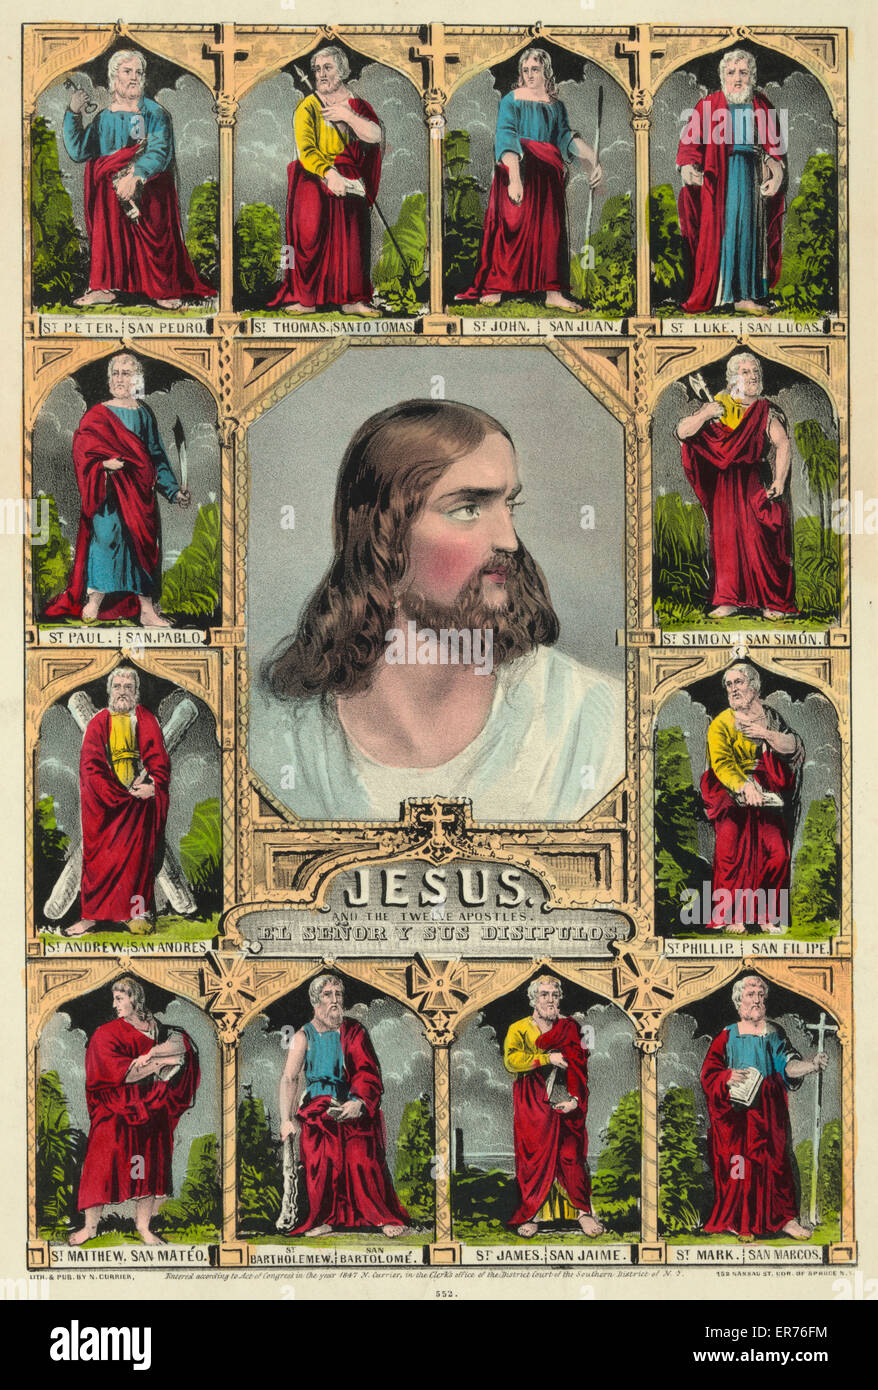 Jesus: and the twelve apostles. Date c1847. - Stock Image